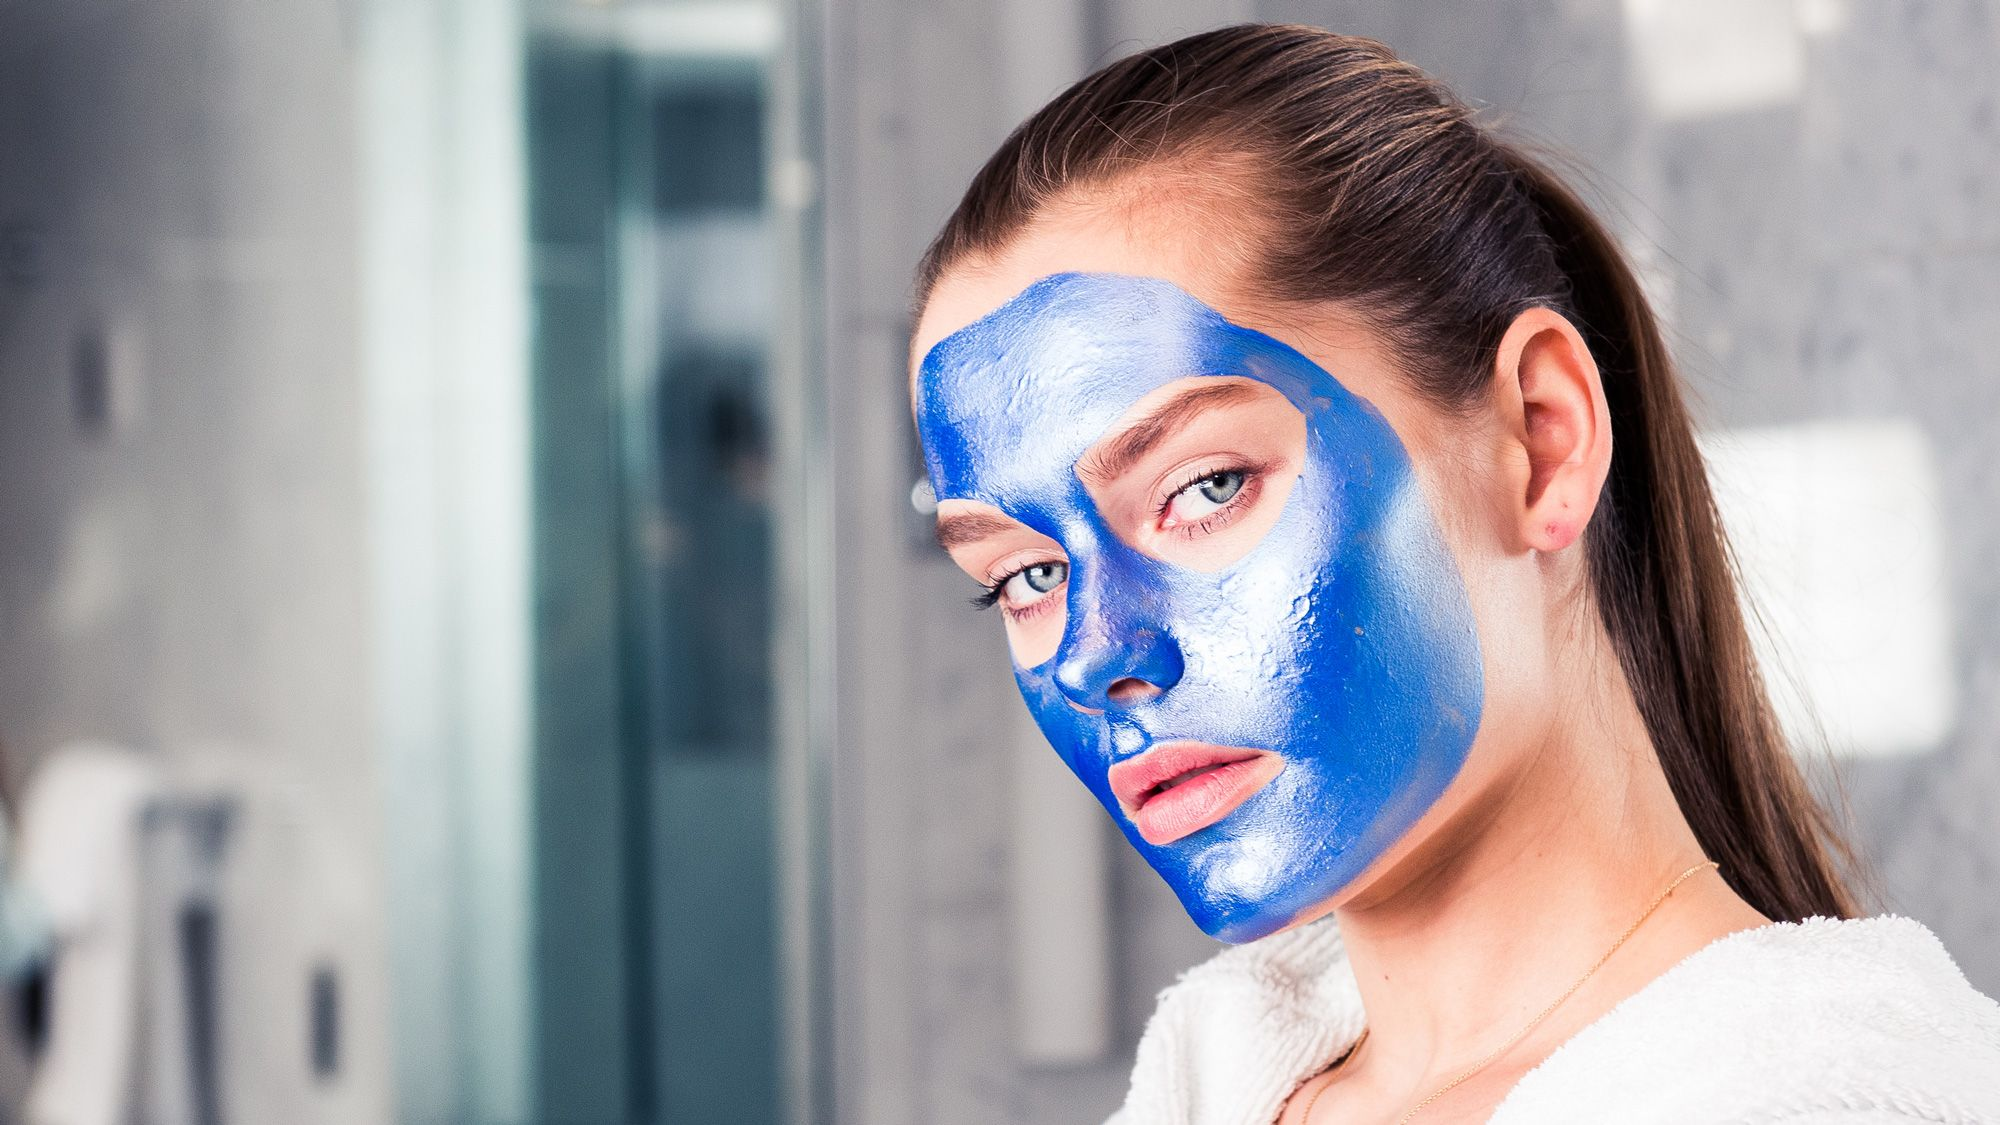 winter skin products editors swear by